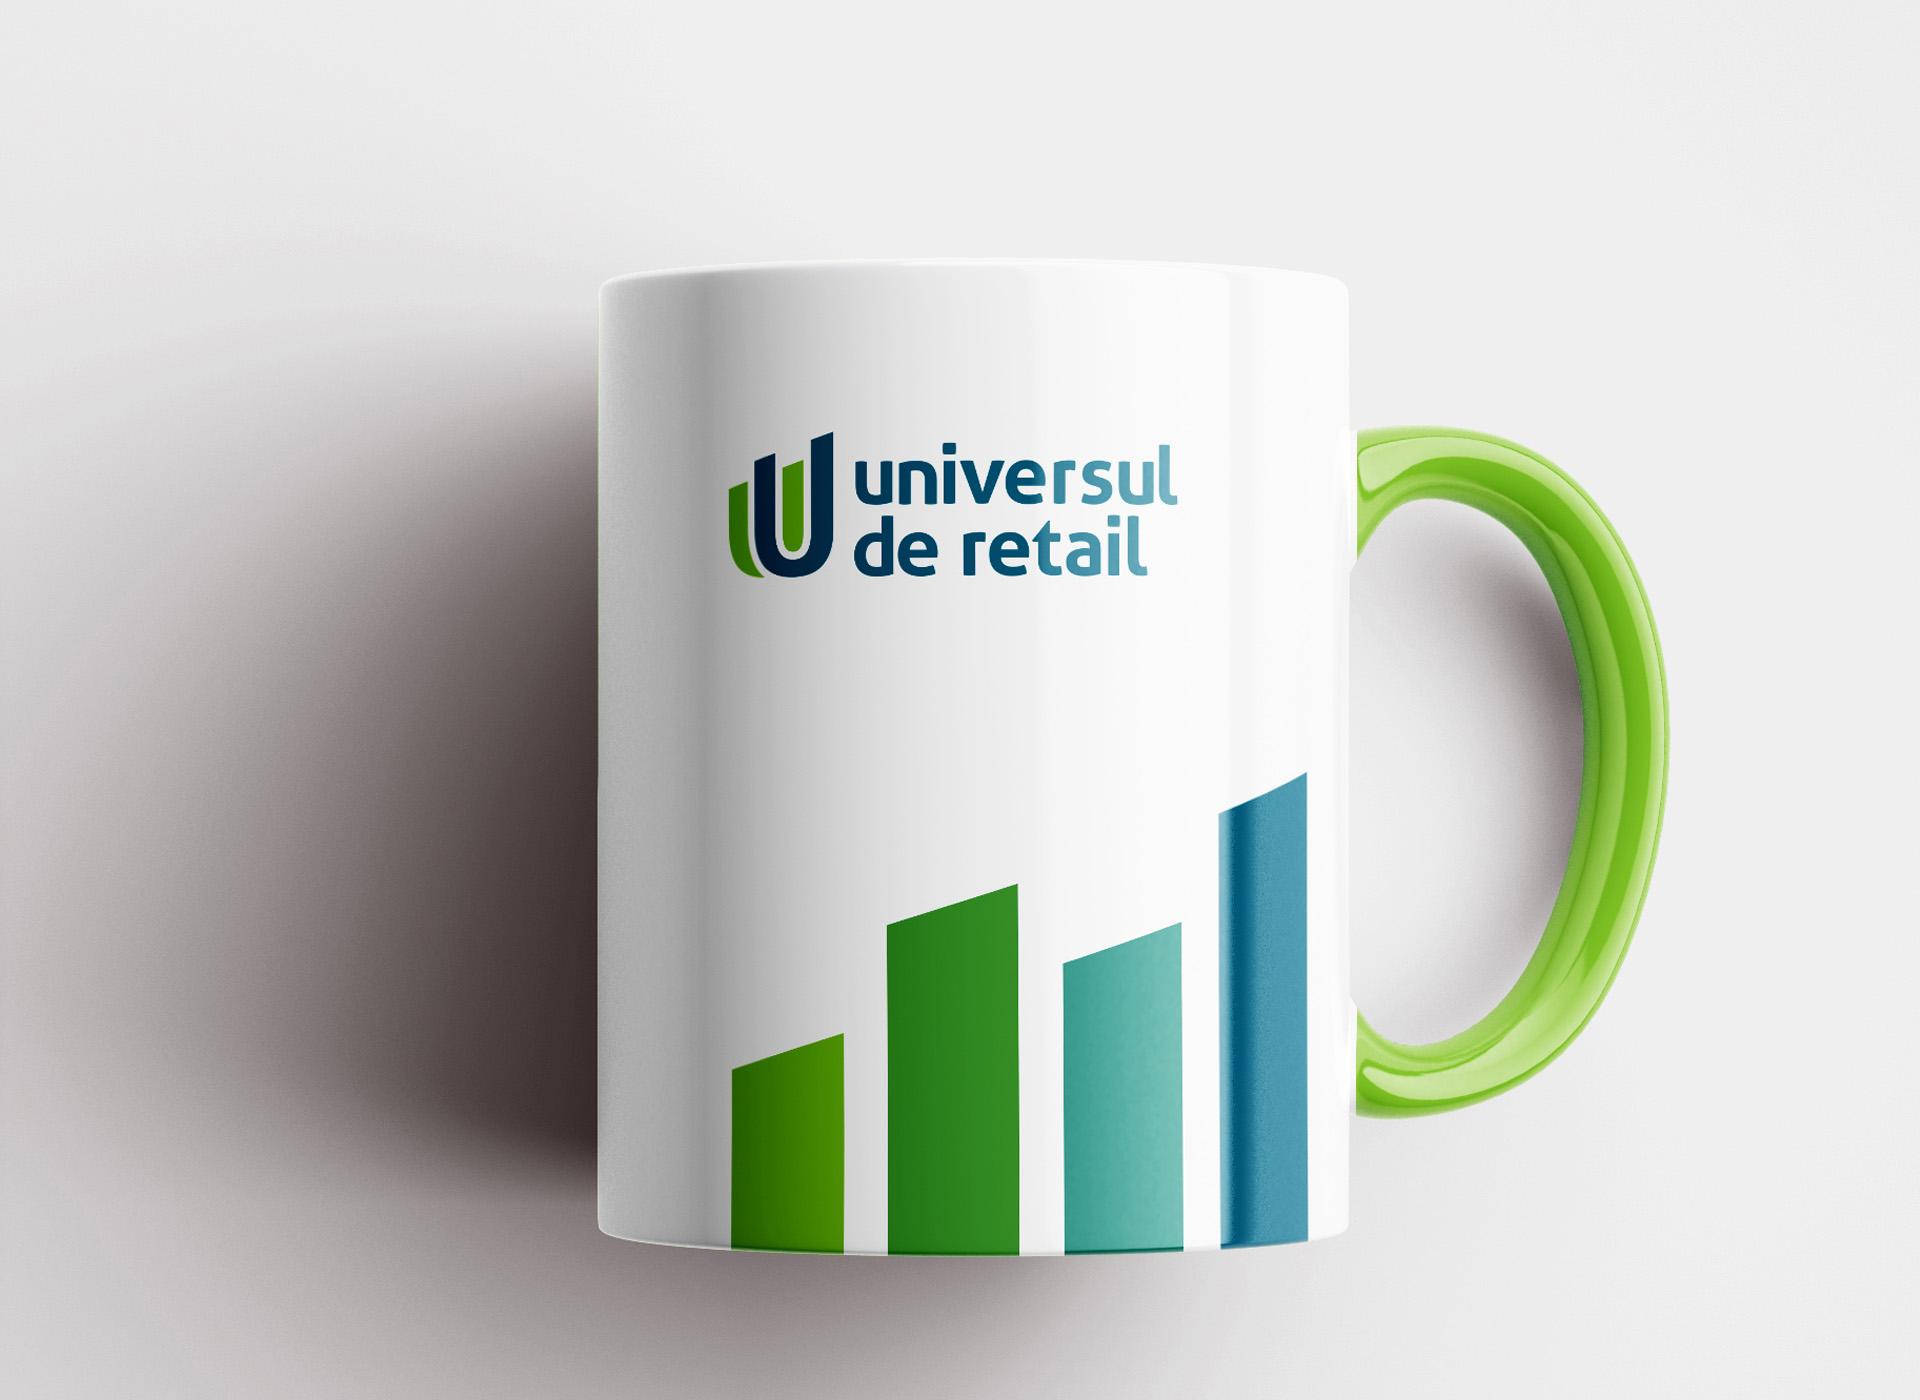 universul de retail portofoliu inoveo mug